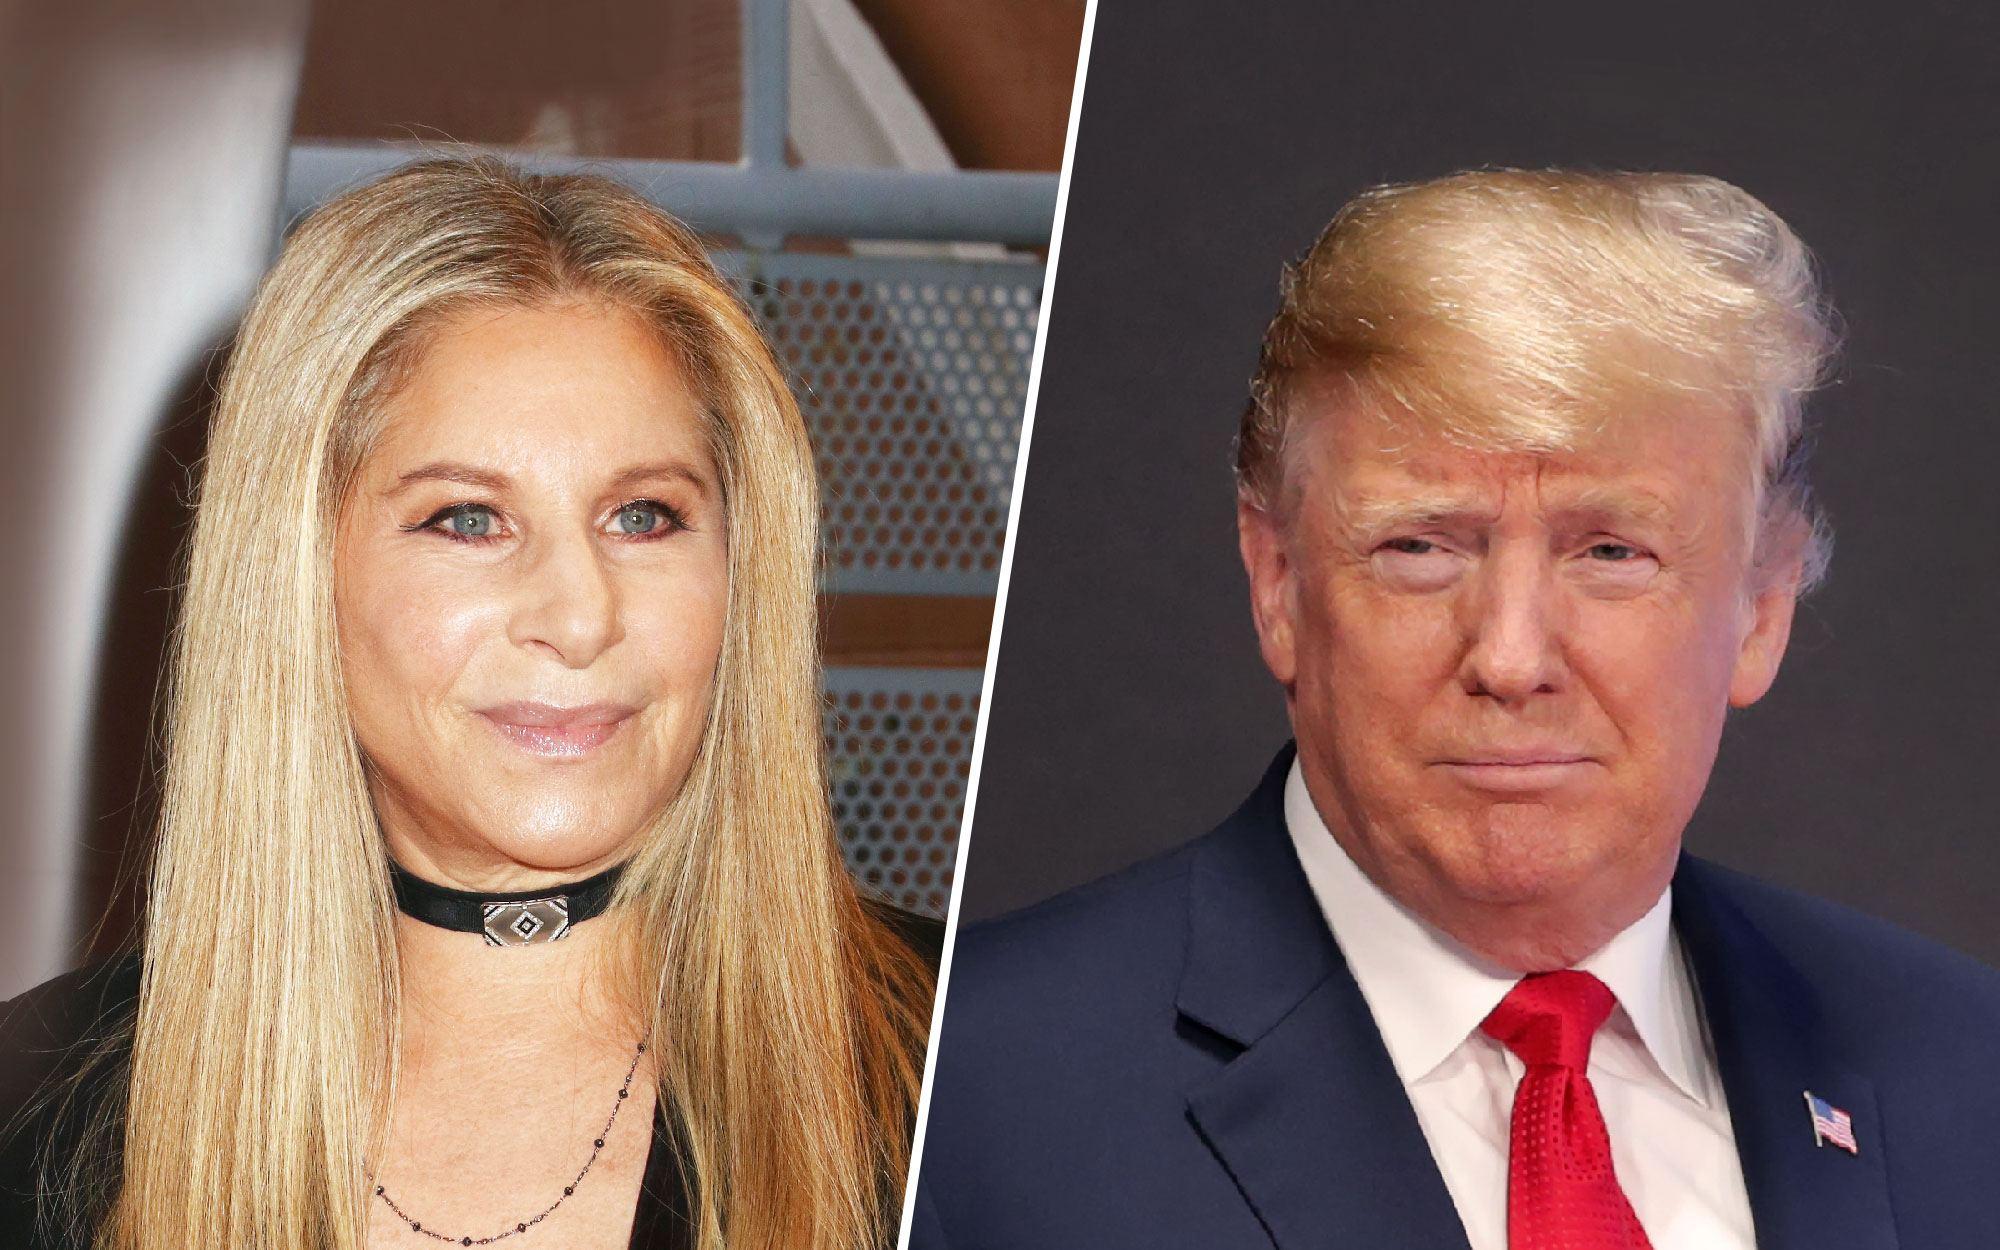 Barbra Streisand Declares Donald Trump Has 'No Regard' for America's Environment